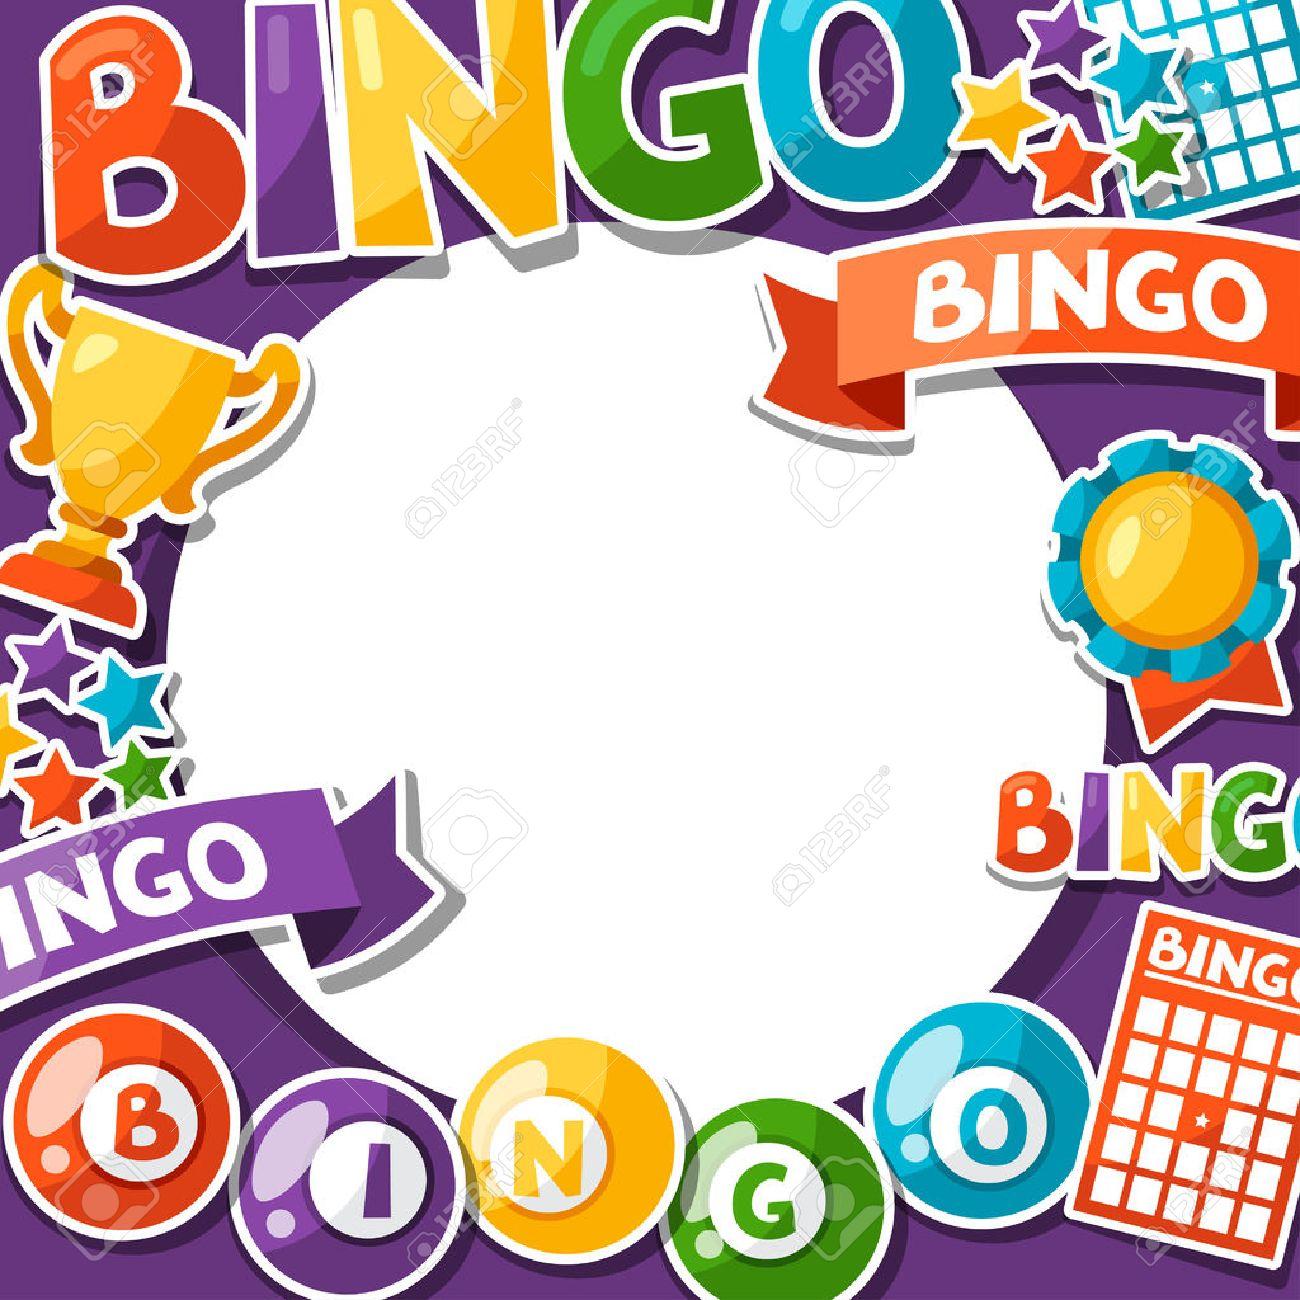 12 849 bingo cliparts stock vector and royalty free bingo illustrations rh 123rf com